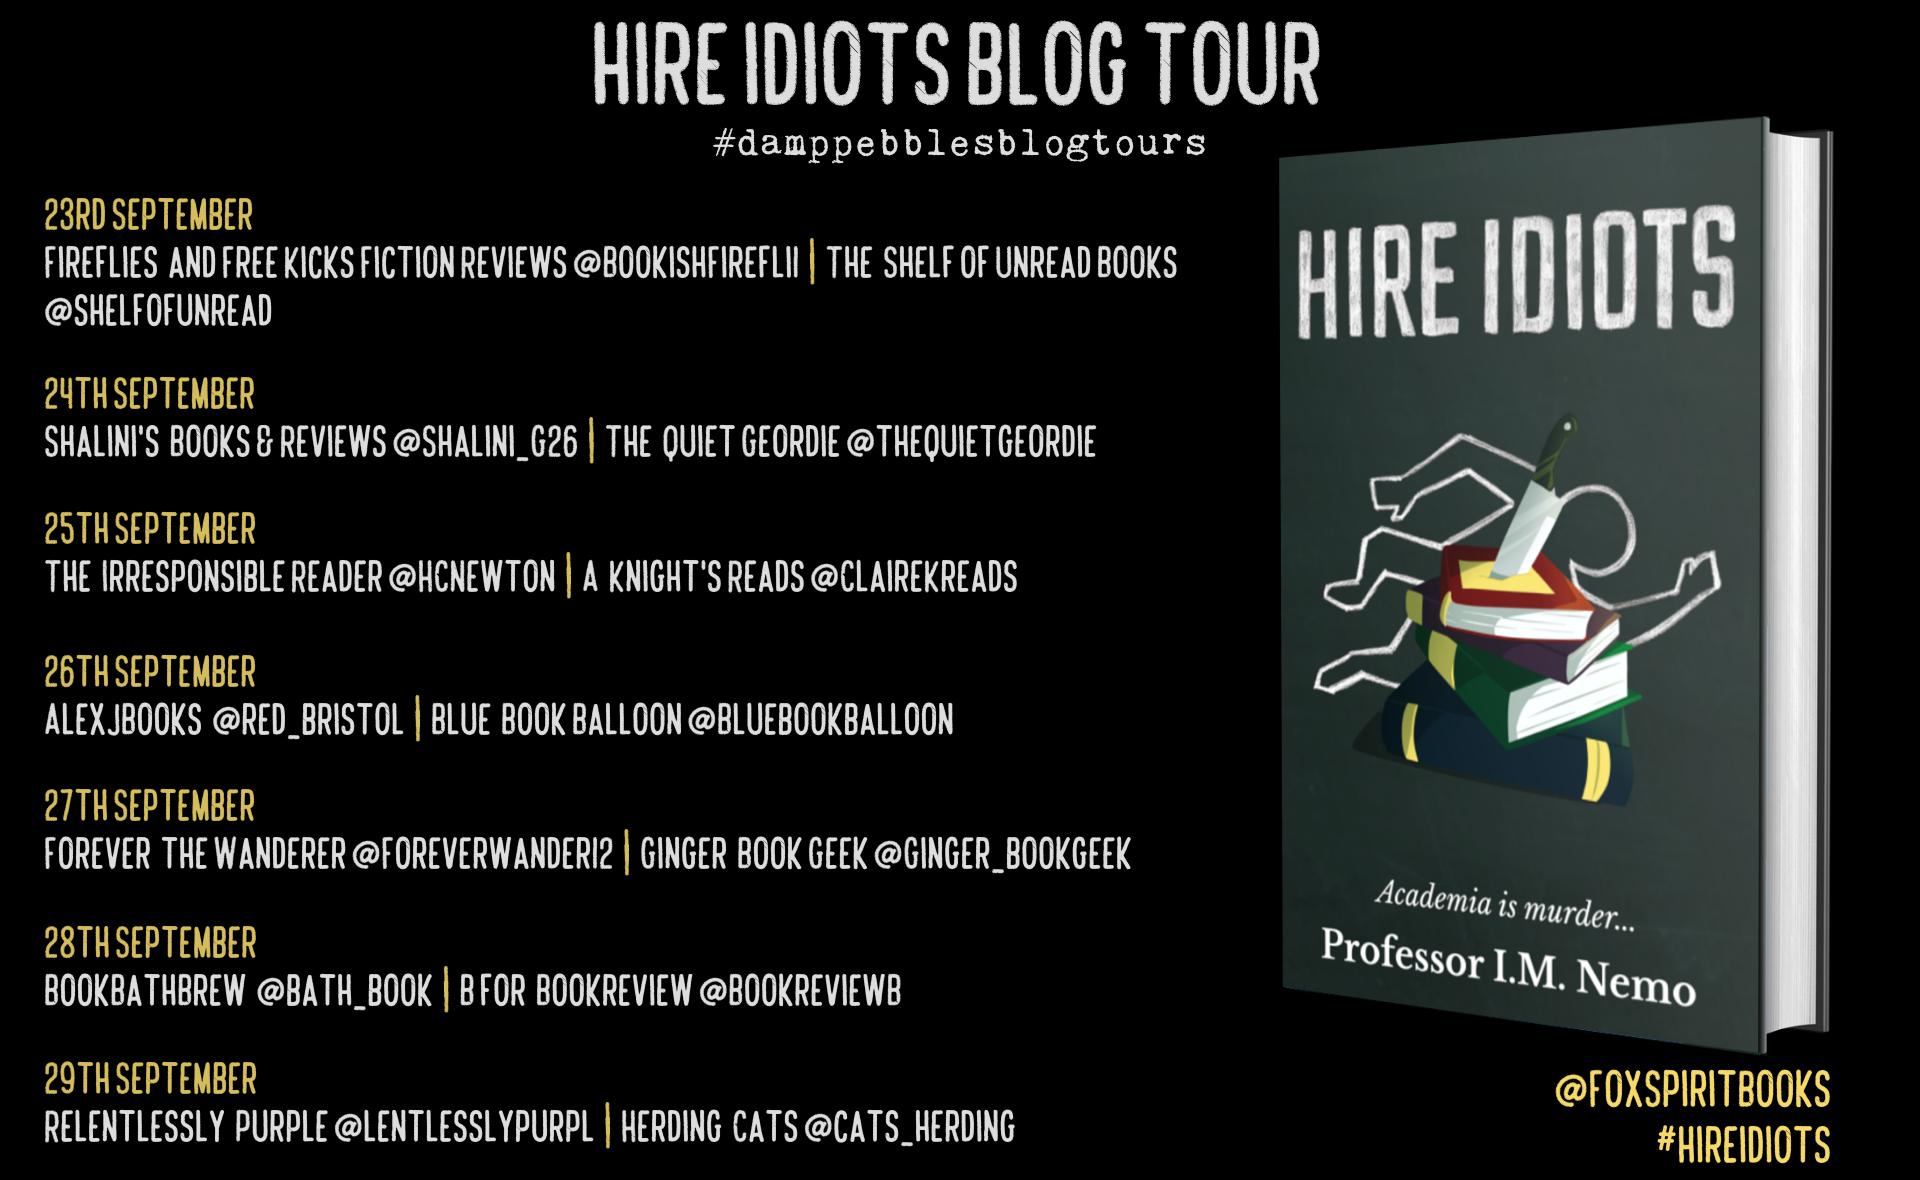 Hire Idiots Blog Tour Poster